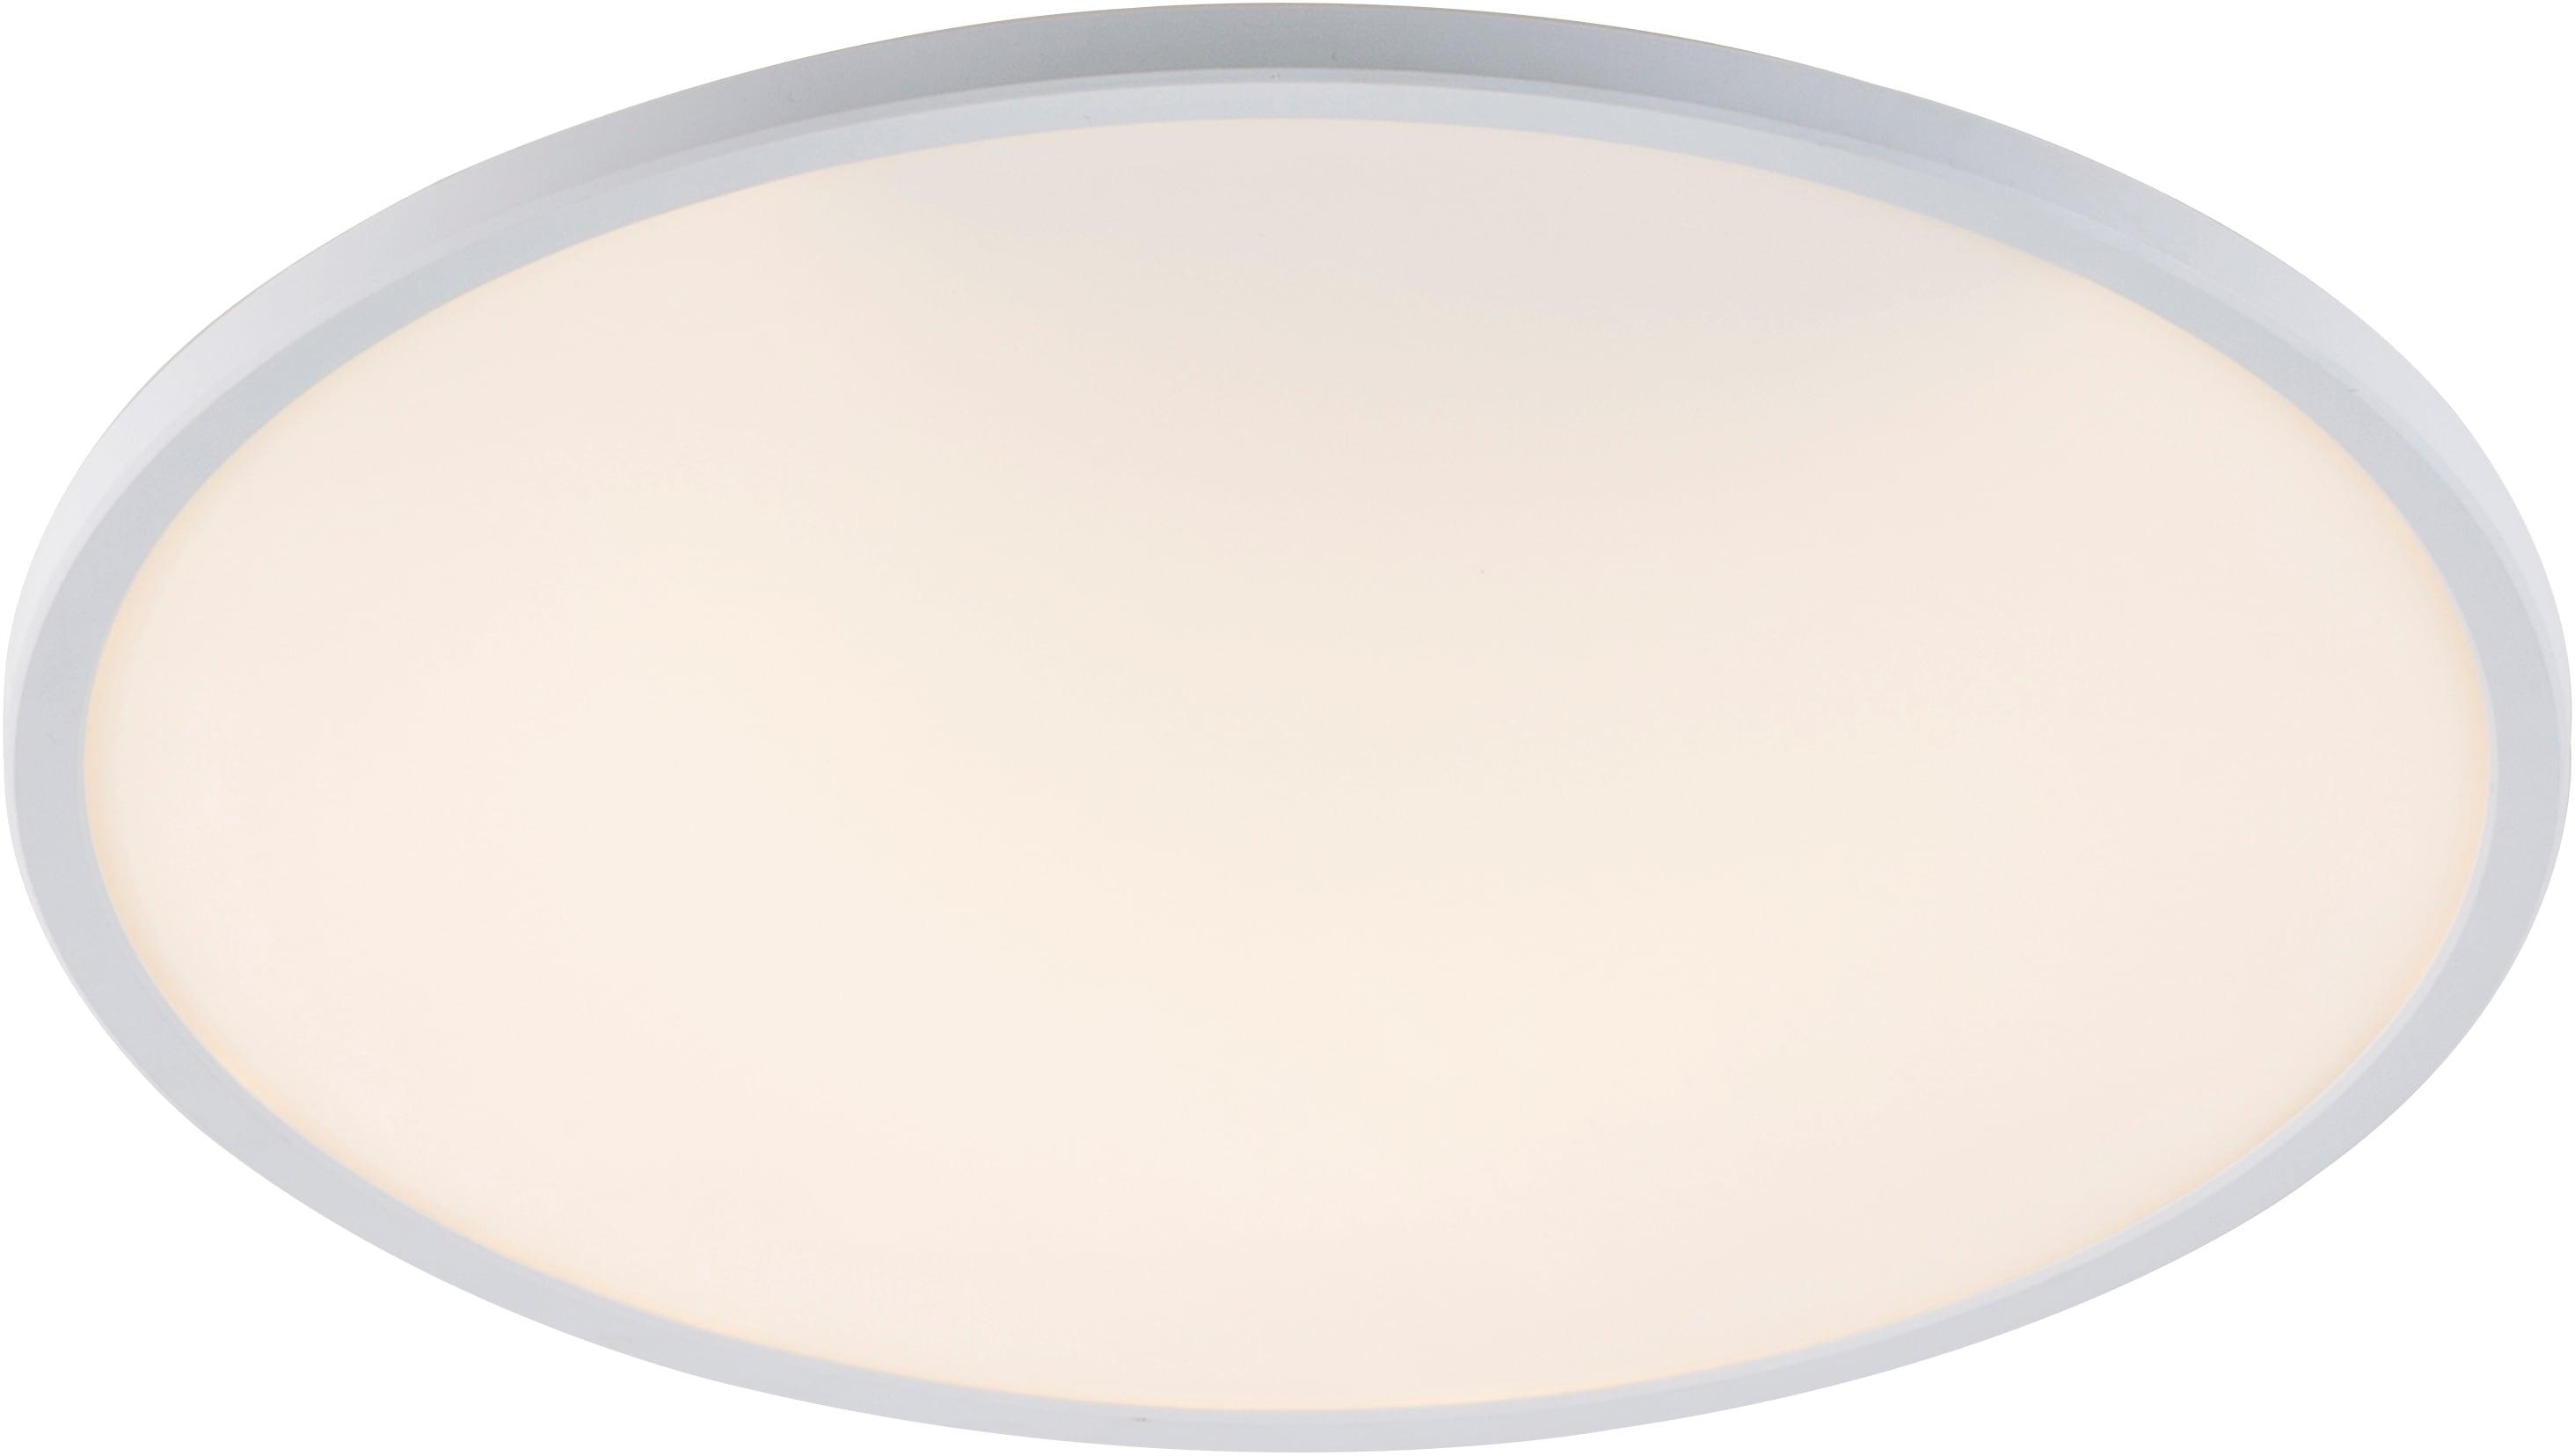 Nordlux LED Deckenleuchte OJA 42 IP54 2700 K Dim, LED-Board, Warmweiß, LED Deckenlampe